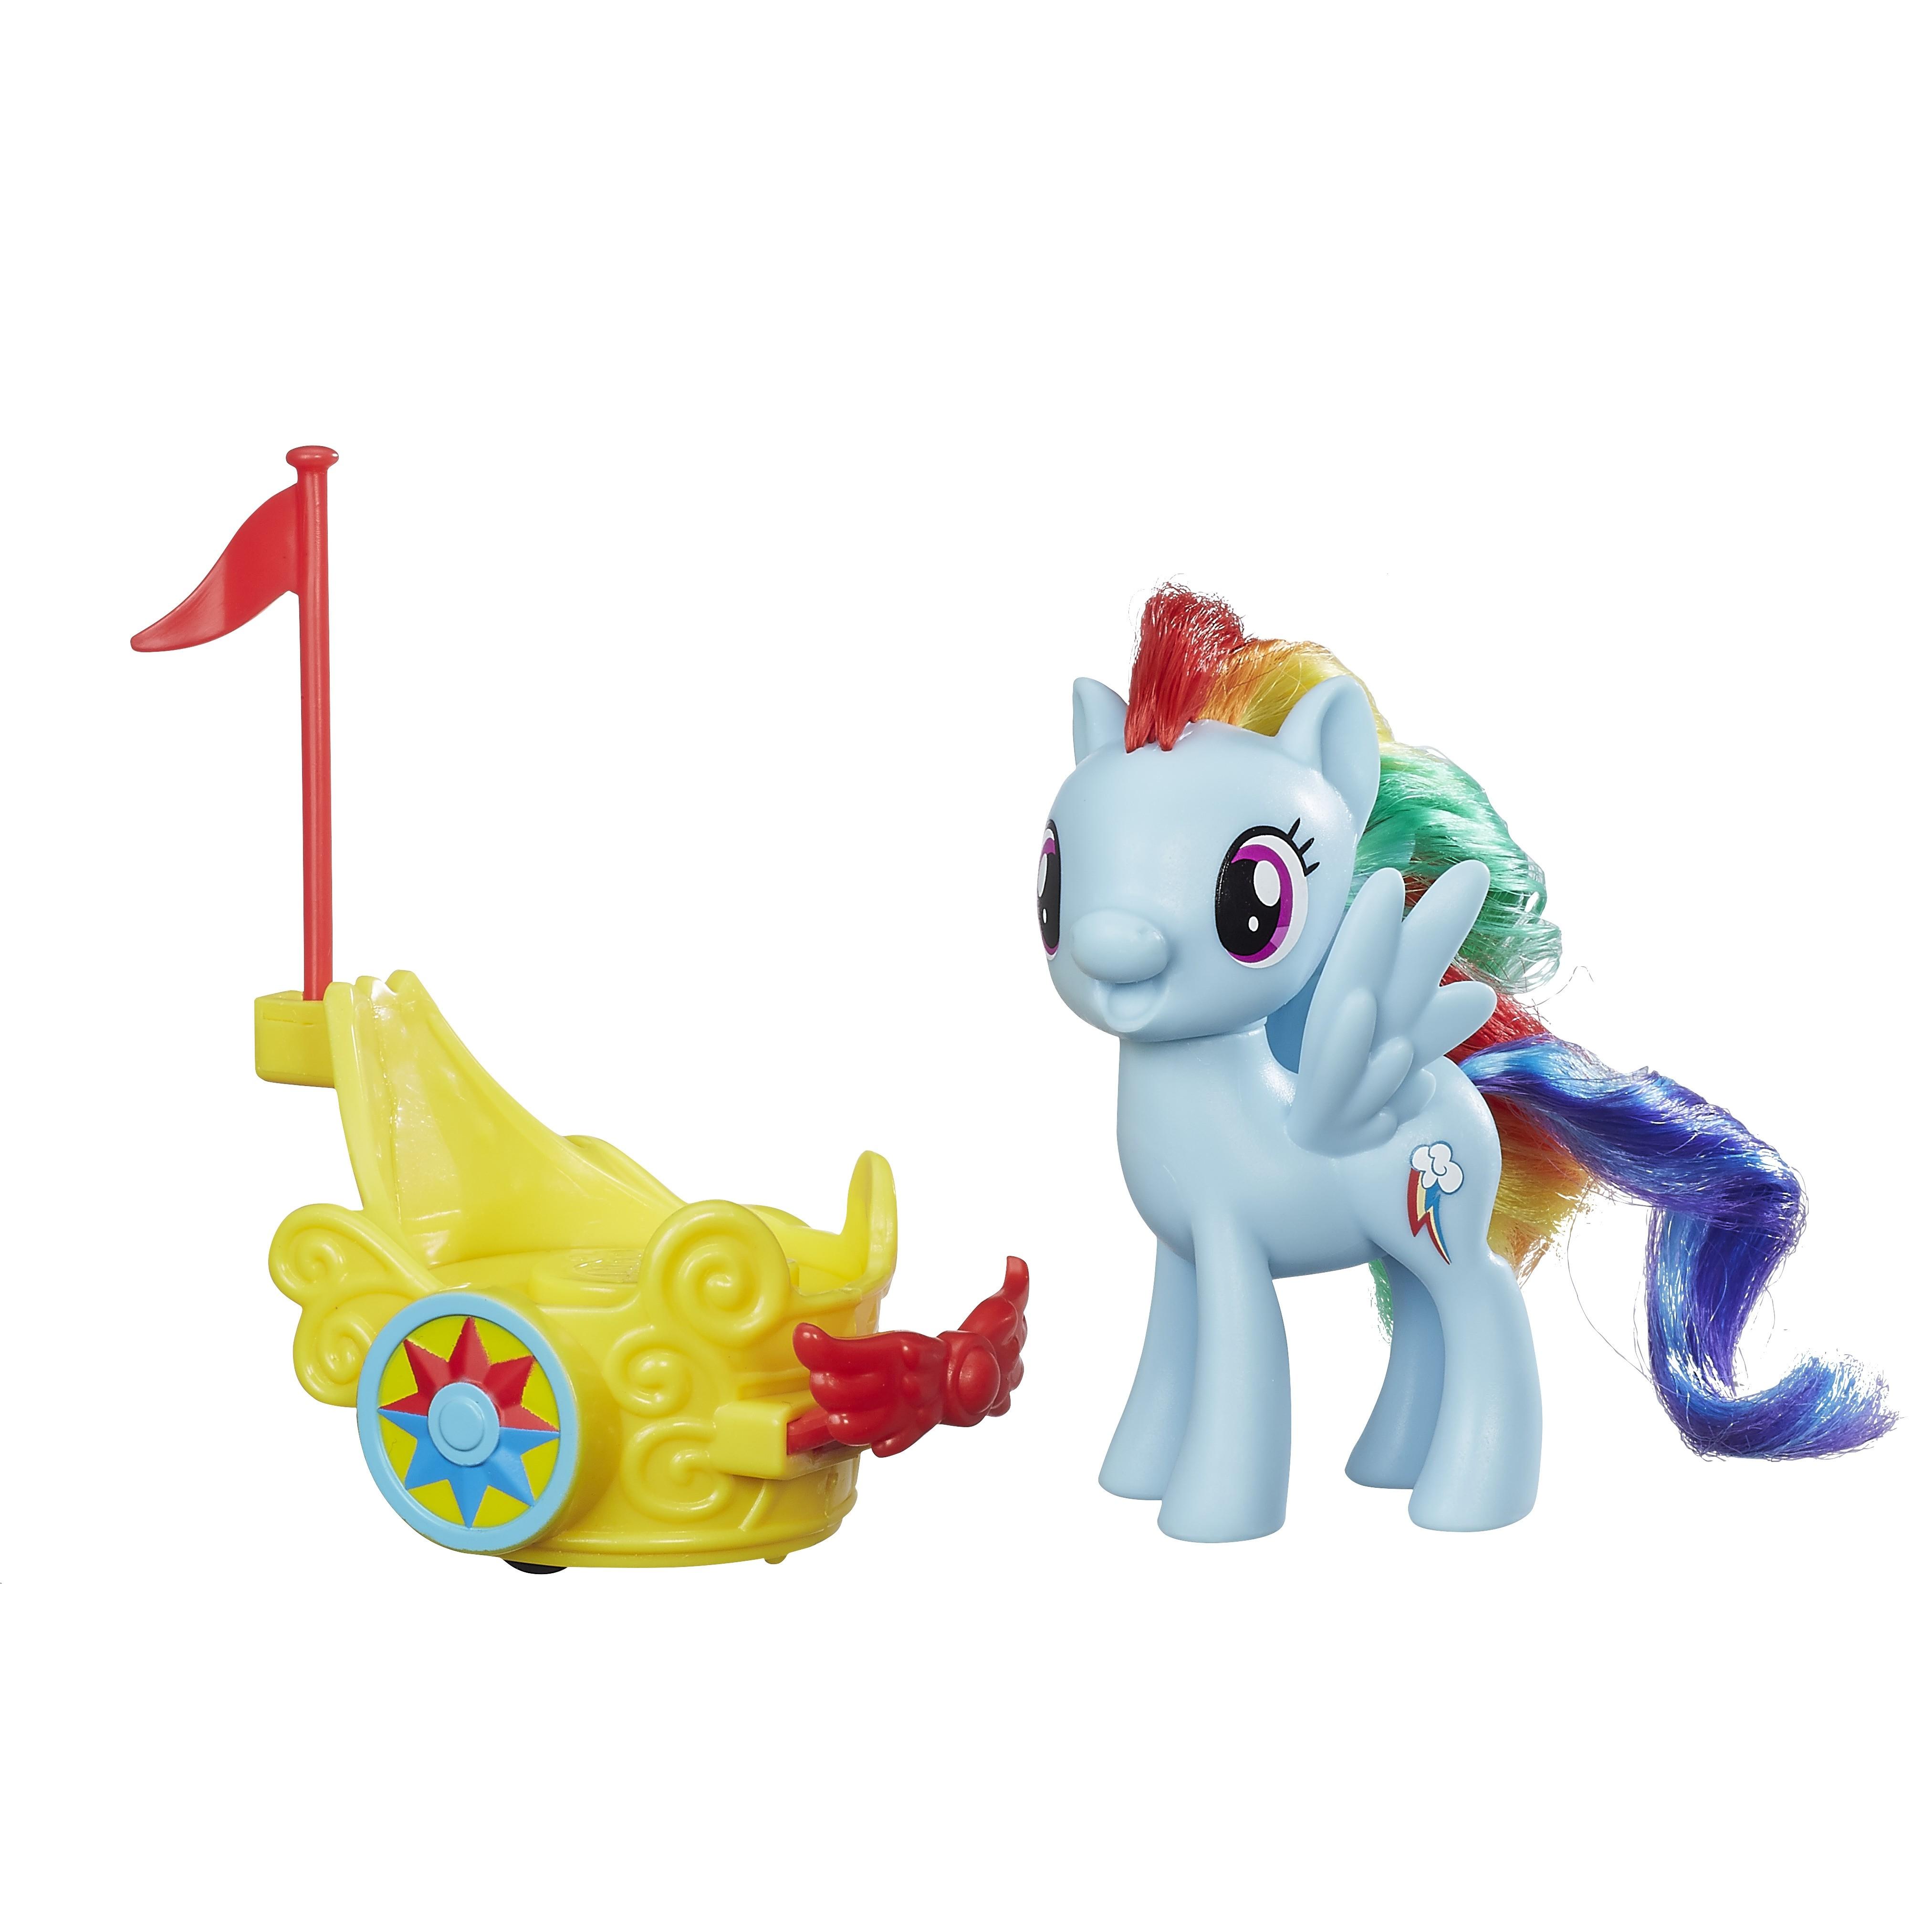 My Little Pony My Little Pony Пони в карете игровой набор my little pony пони в карете в ассортименте